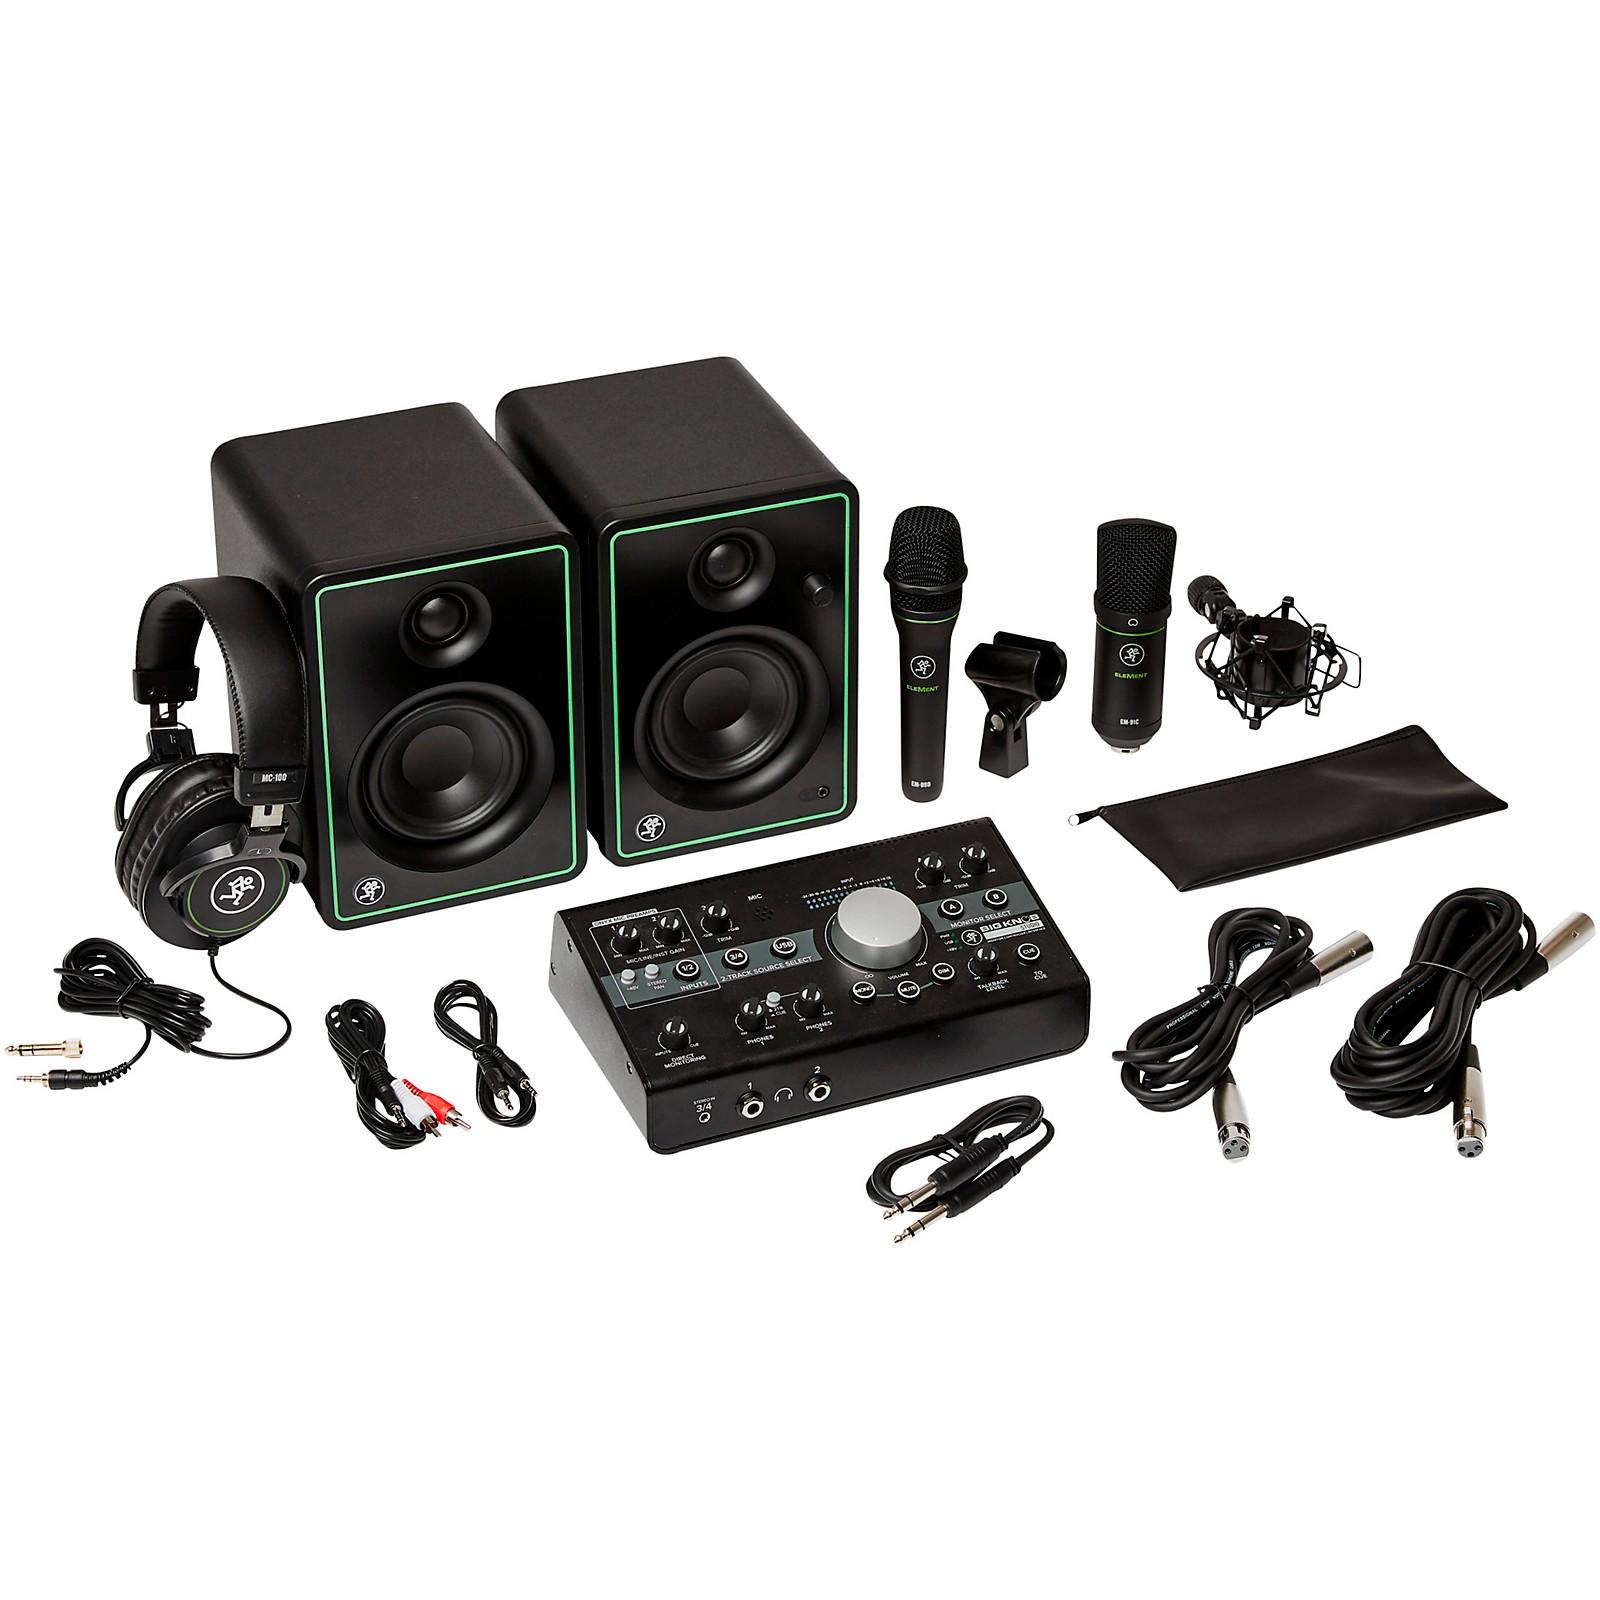 Mackie Studio Bundle with CR3-X Monitors, Big Knob Studio Interface, EM89D Dynamic Mic, EM91C Condenser Mic and MC-100 Headphones